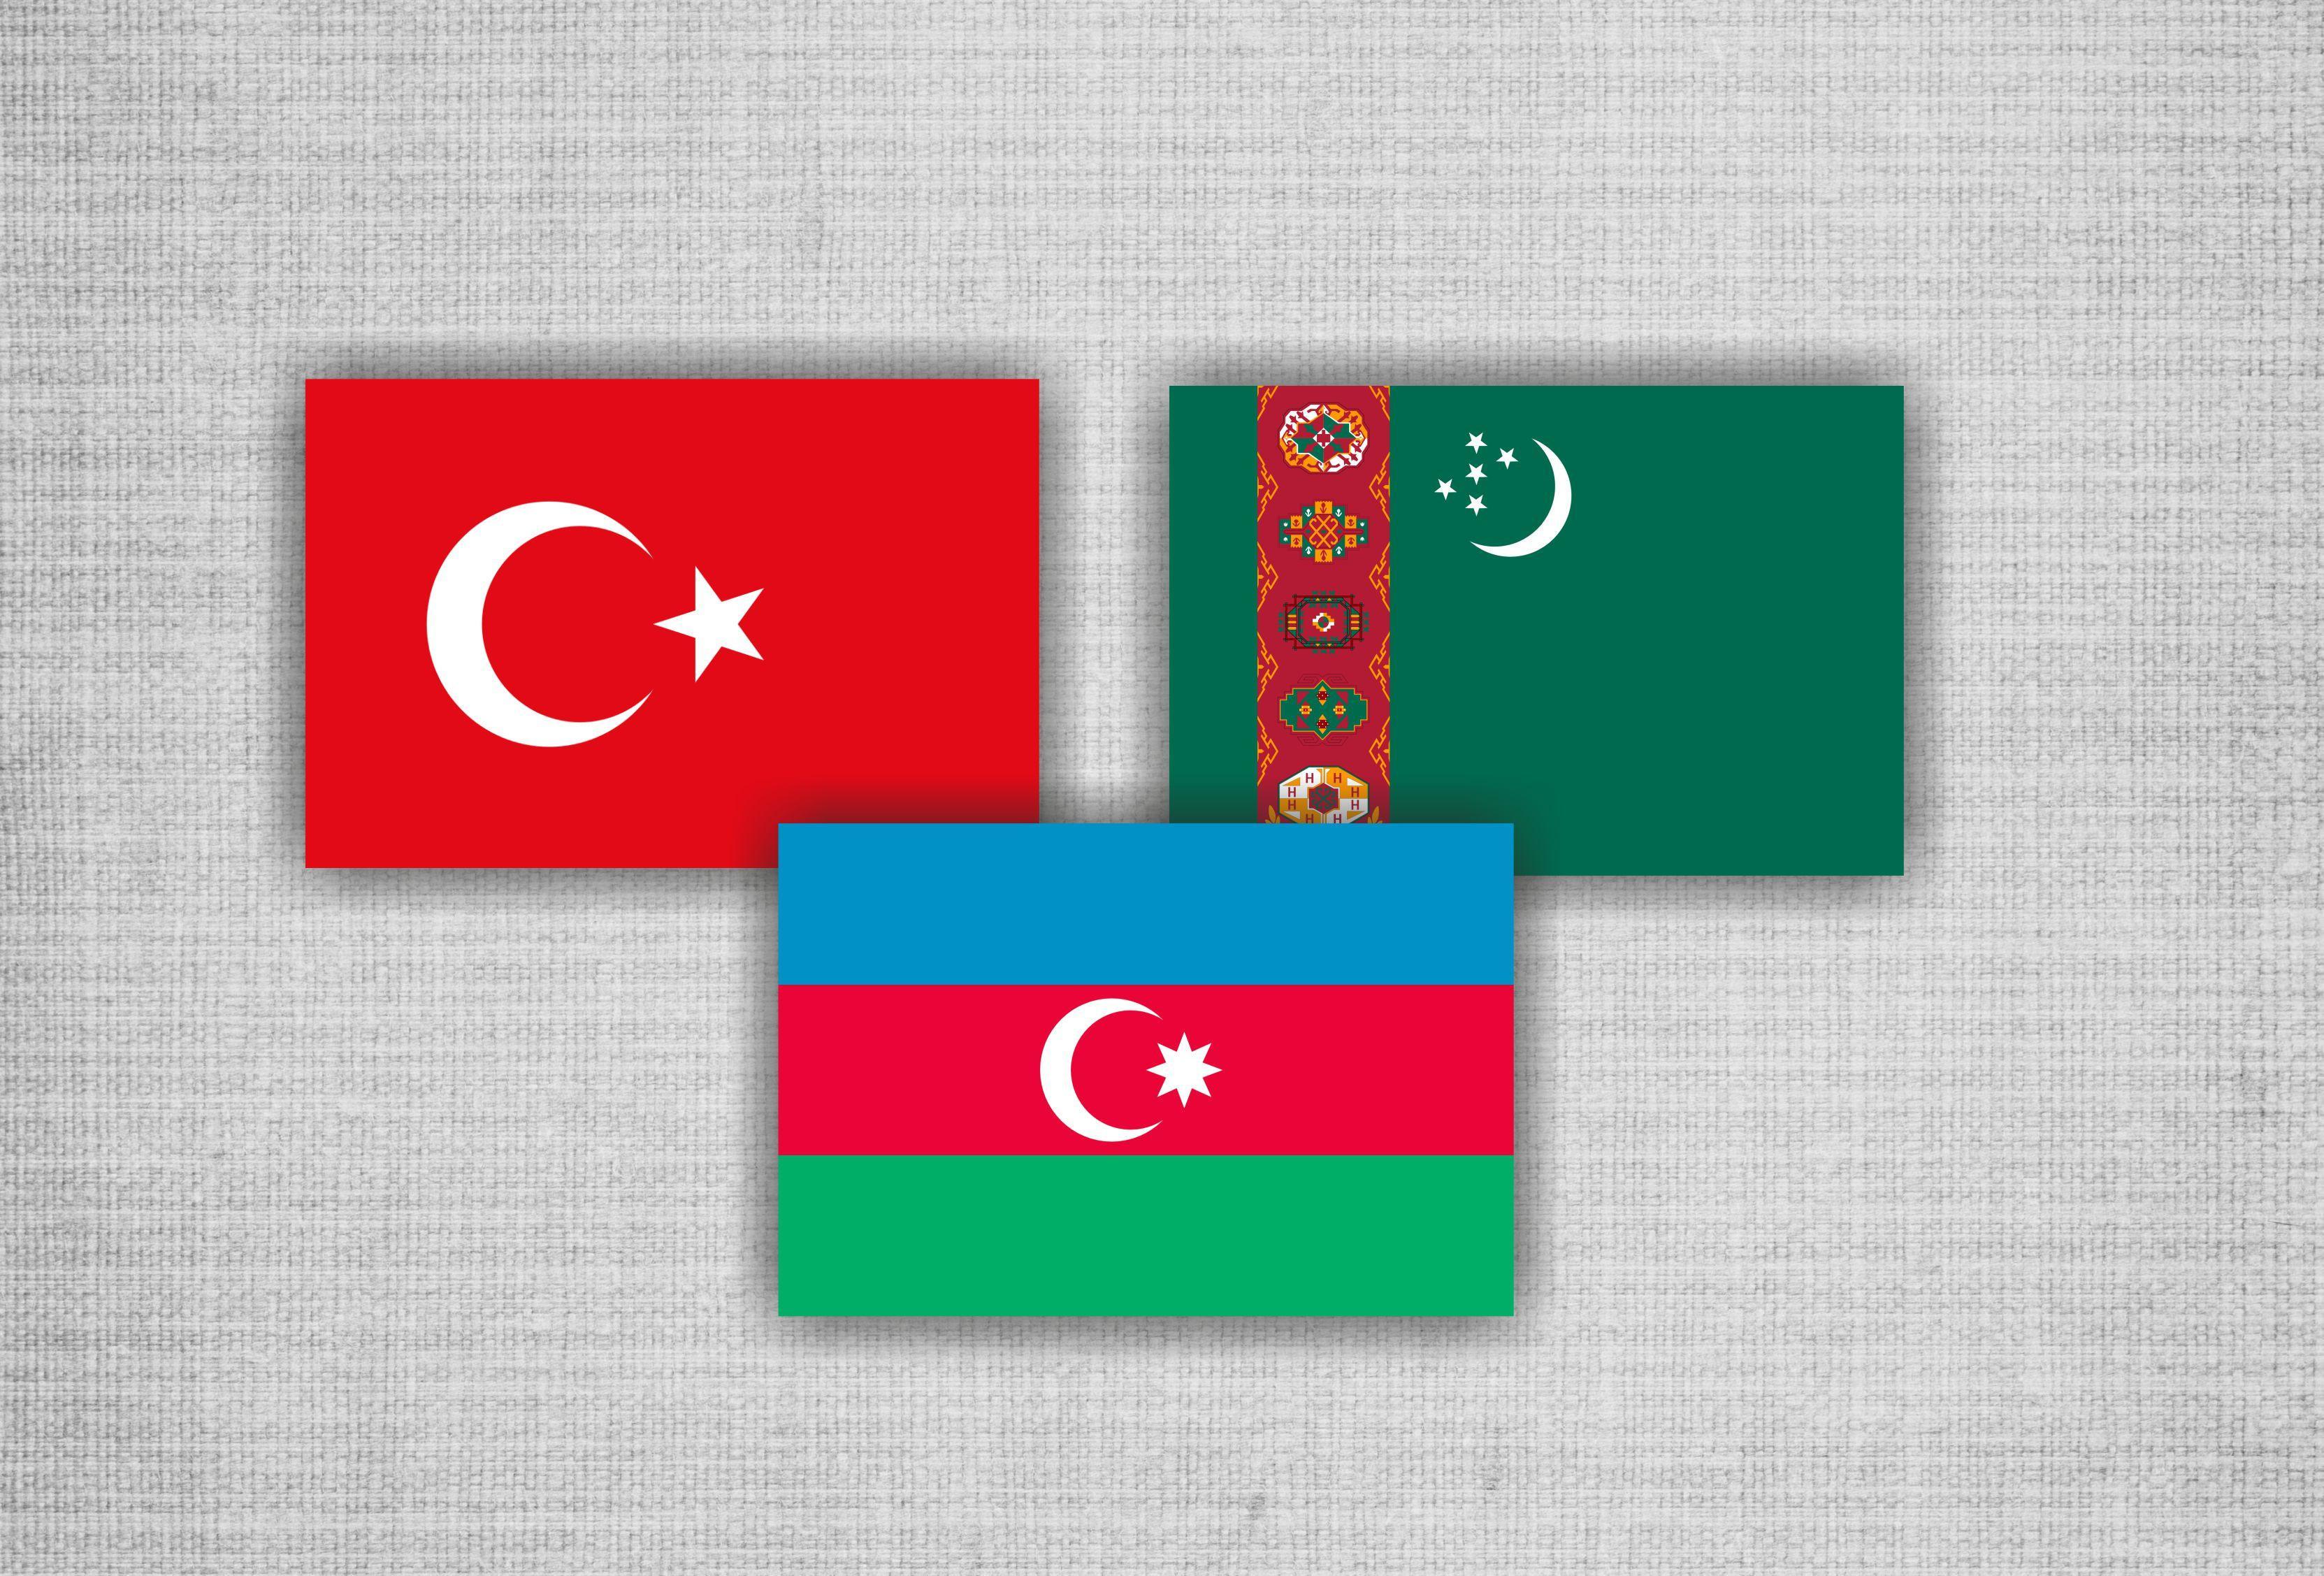 Президенты Азербайджана, Турции и Туркменистана проведут трехстороннюю встречу до конца года